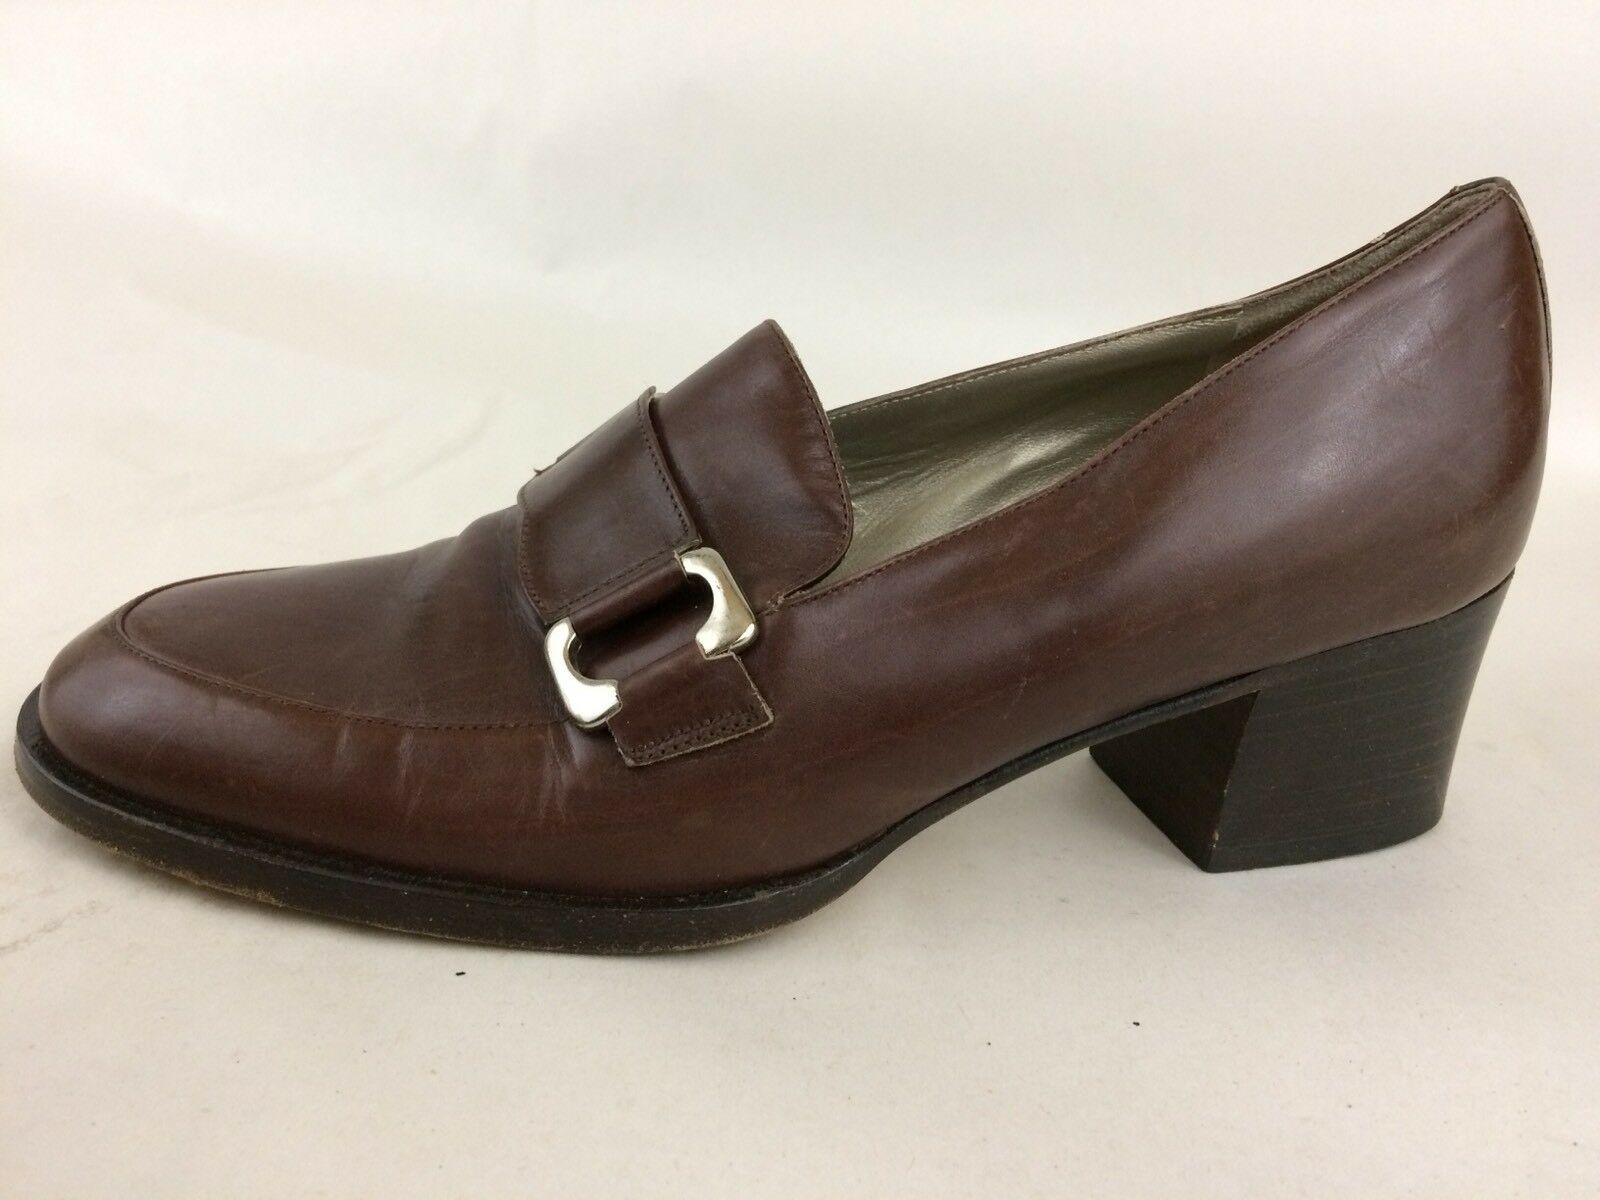 Cole Haan  Womens 6.5 Med Brown High Heel Loafer Moc Toe shoes Leather Belt